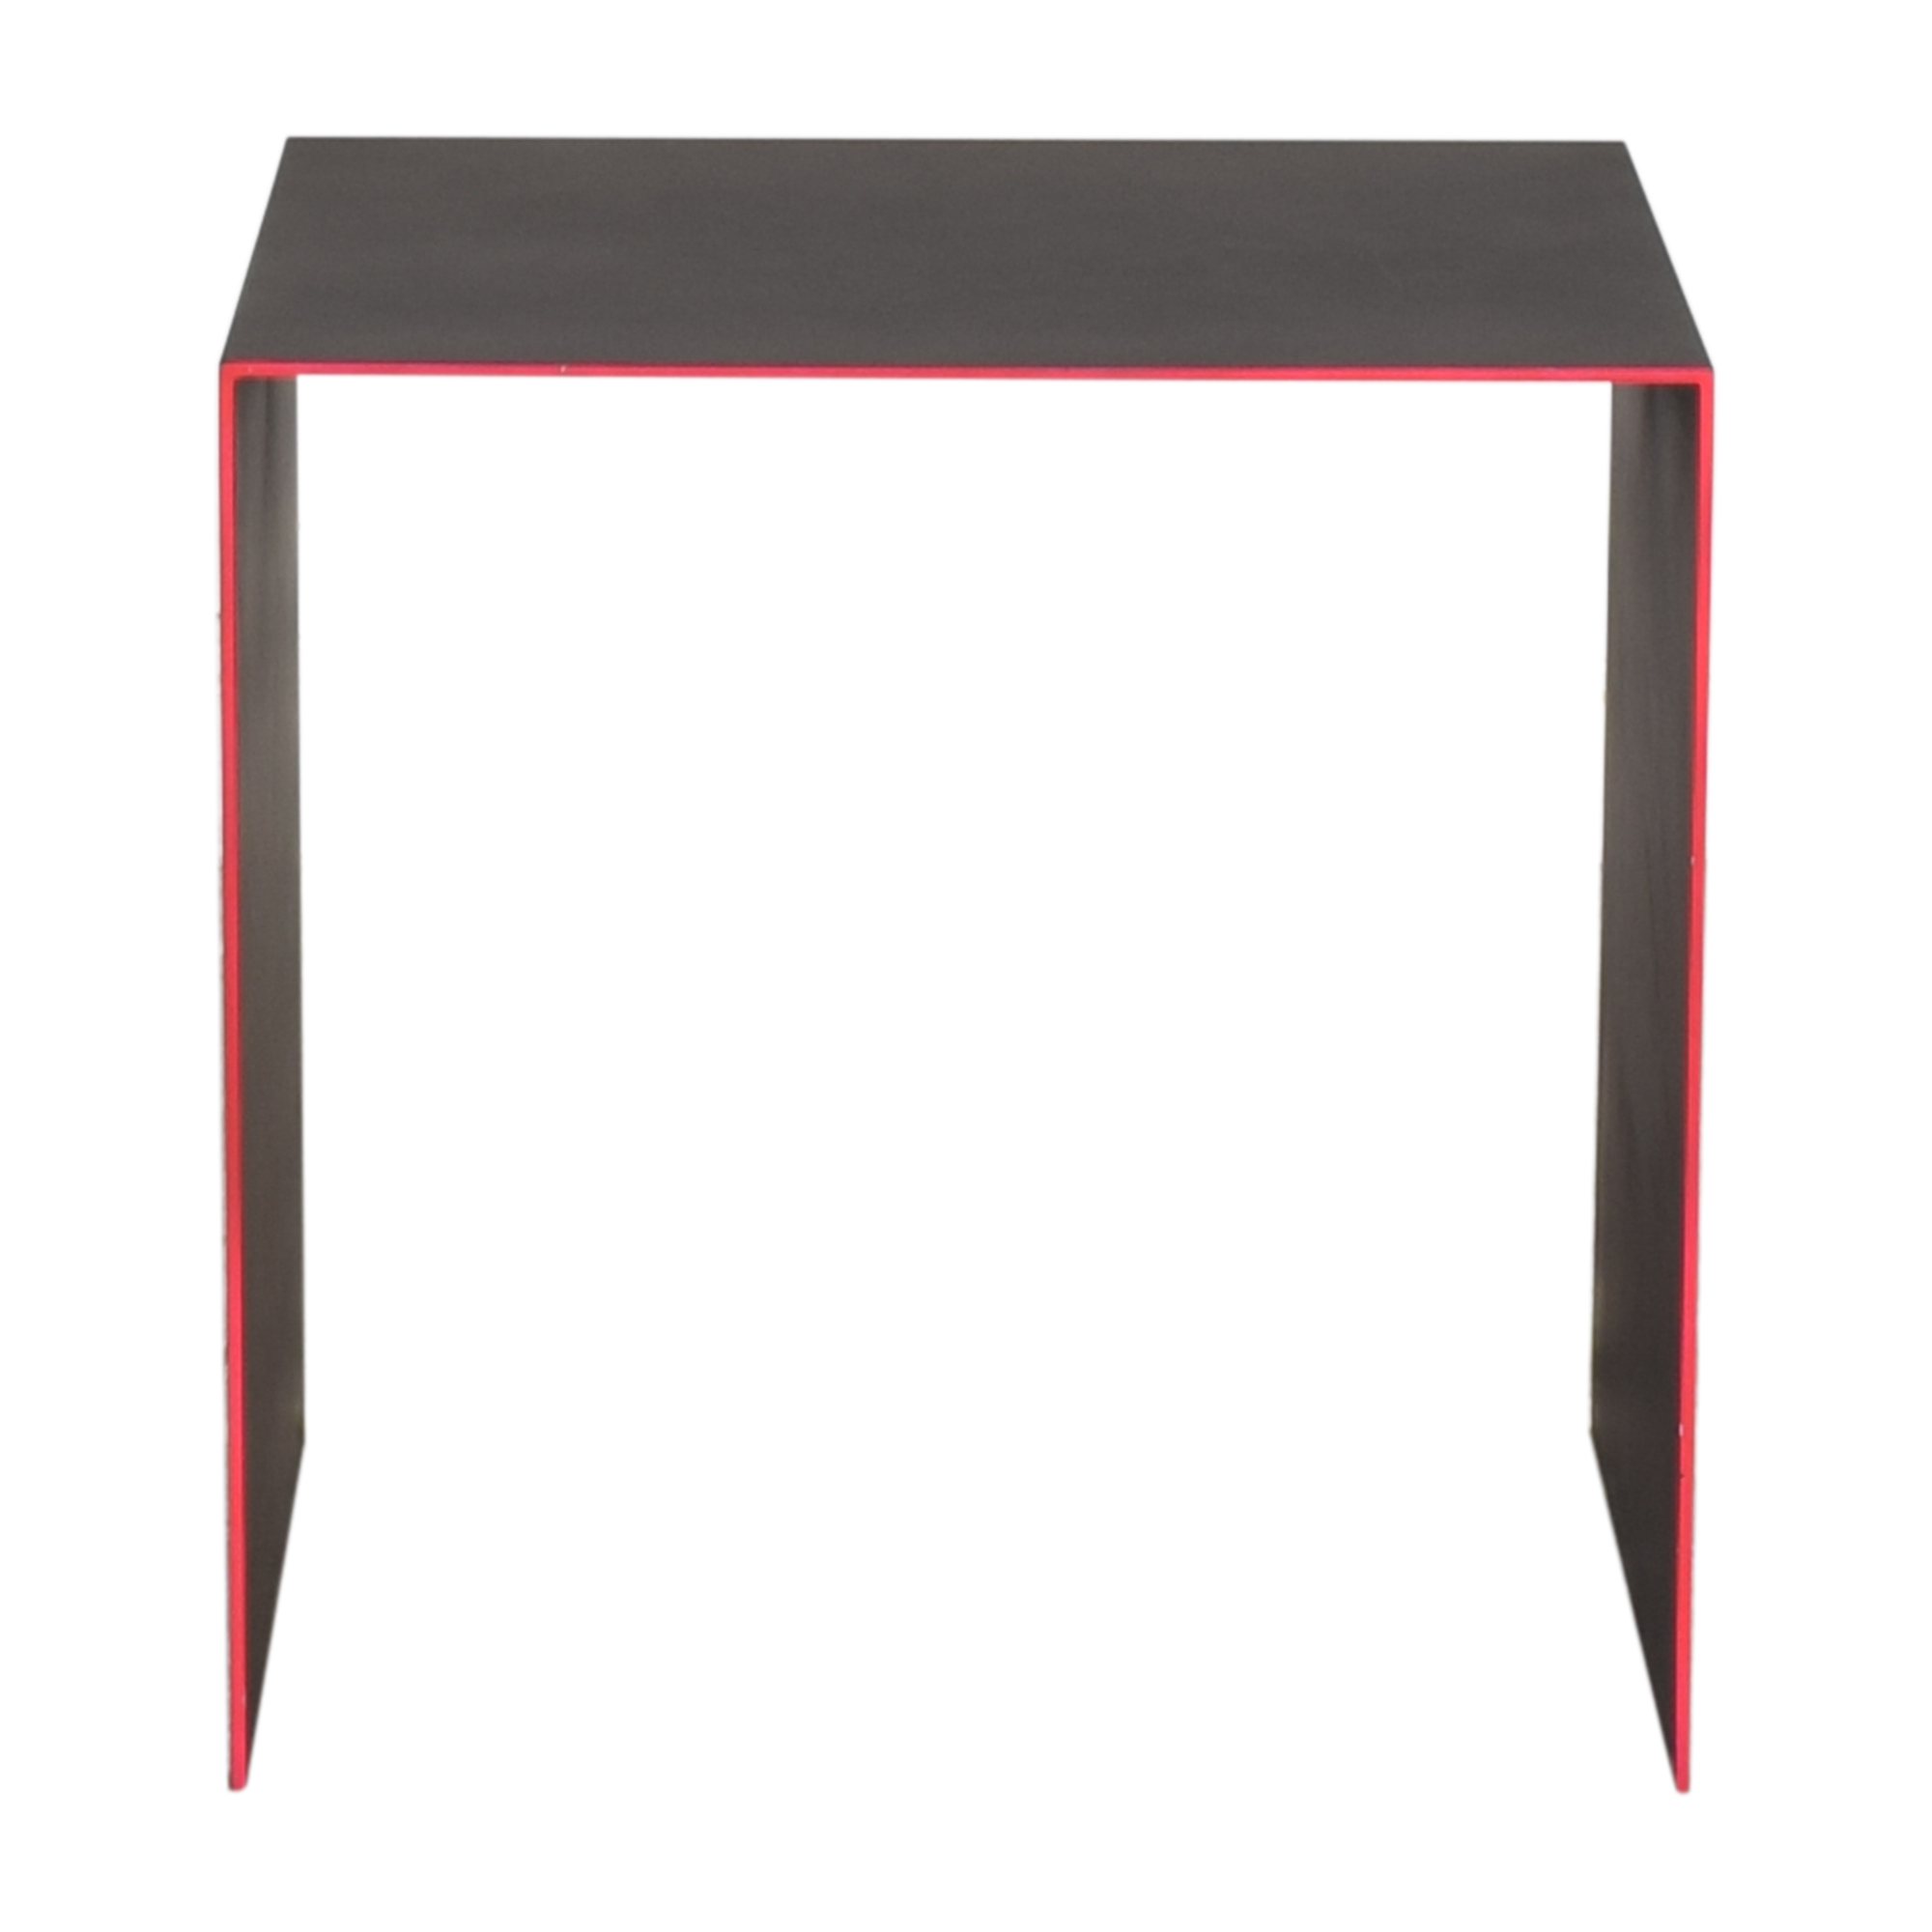 shop ABC Carpet & Home abcDNA Fluid Steel End Table ABC Carpet & Home End Tables